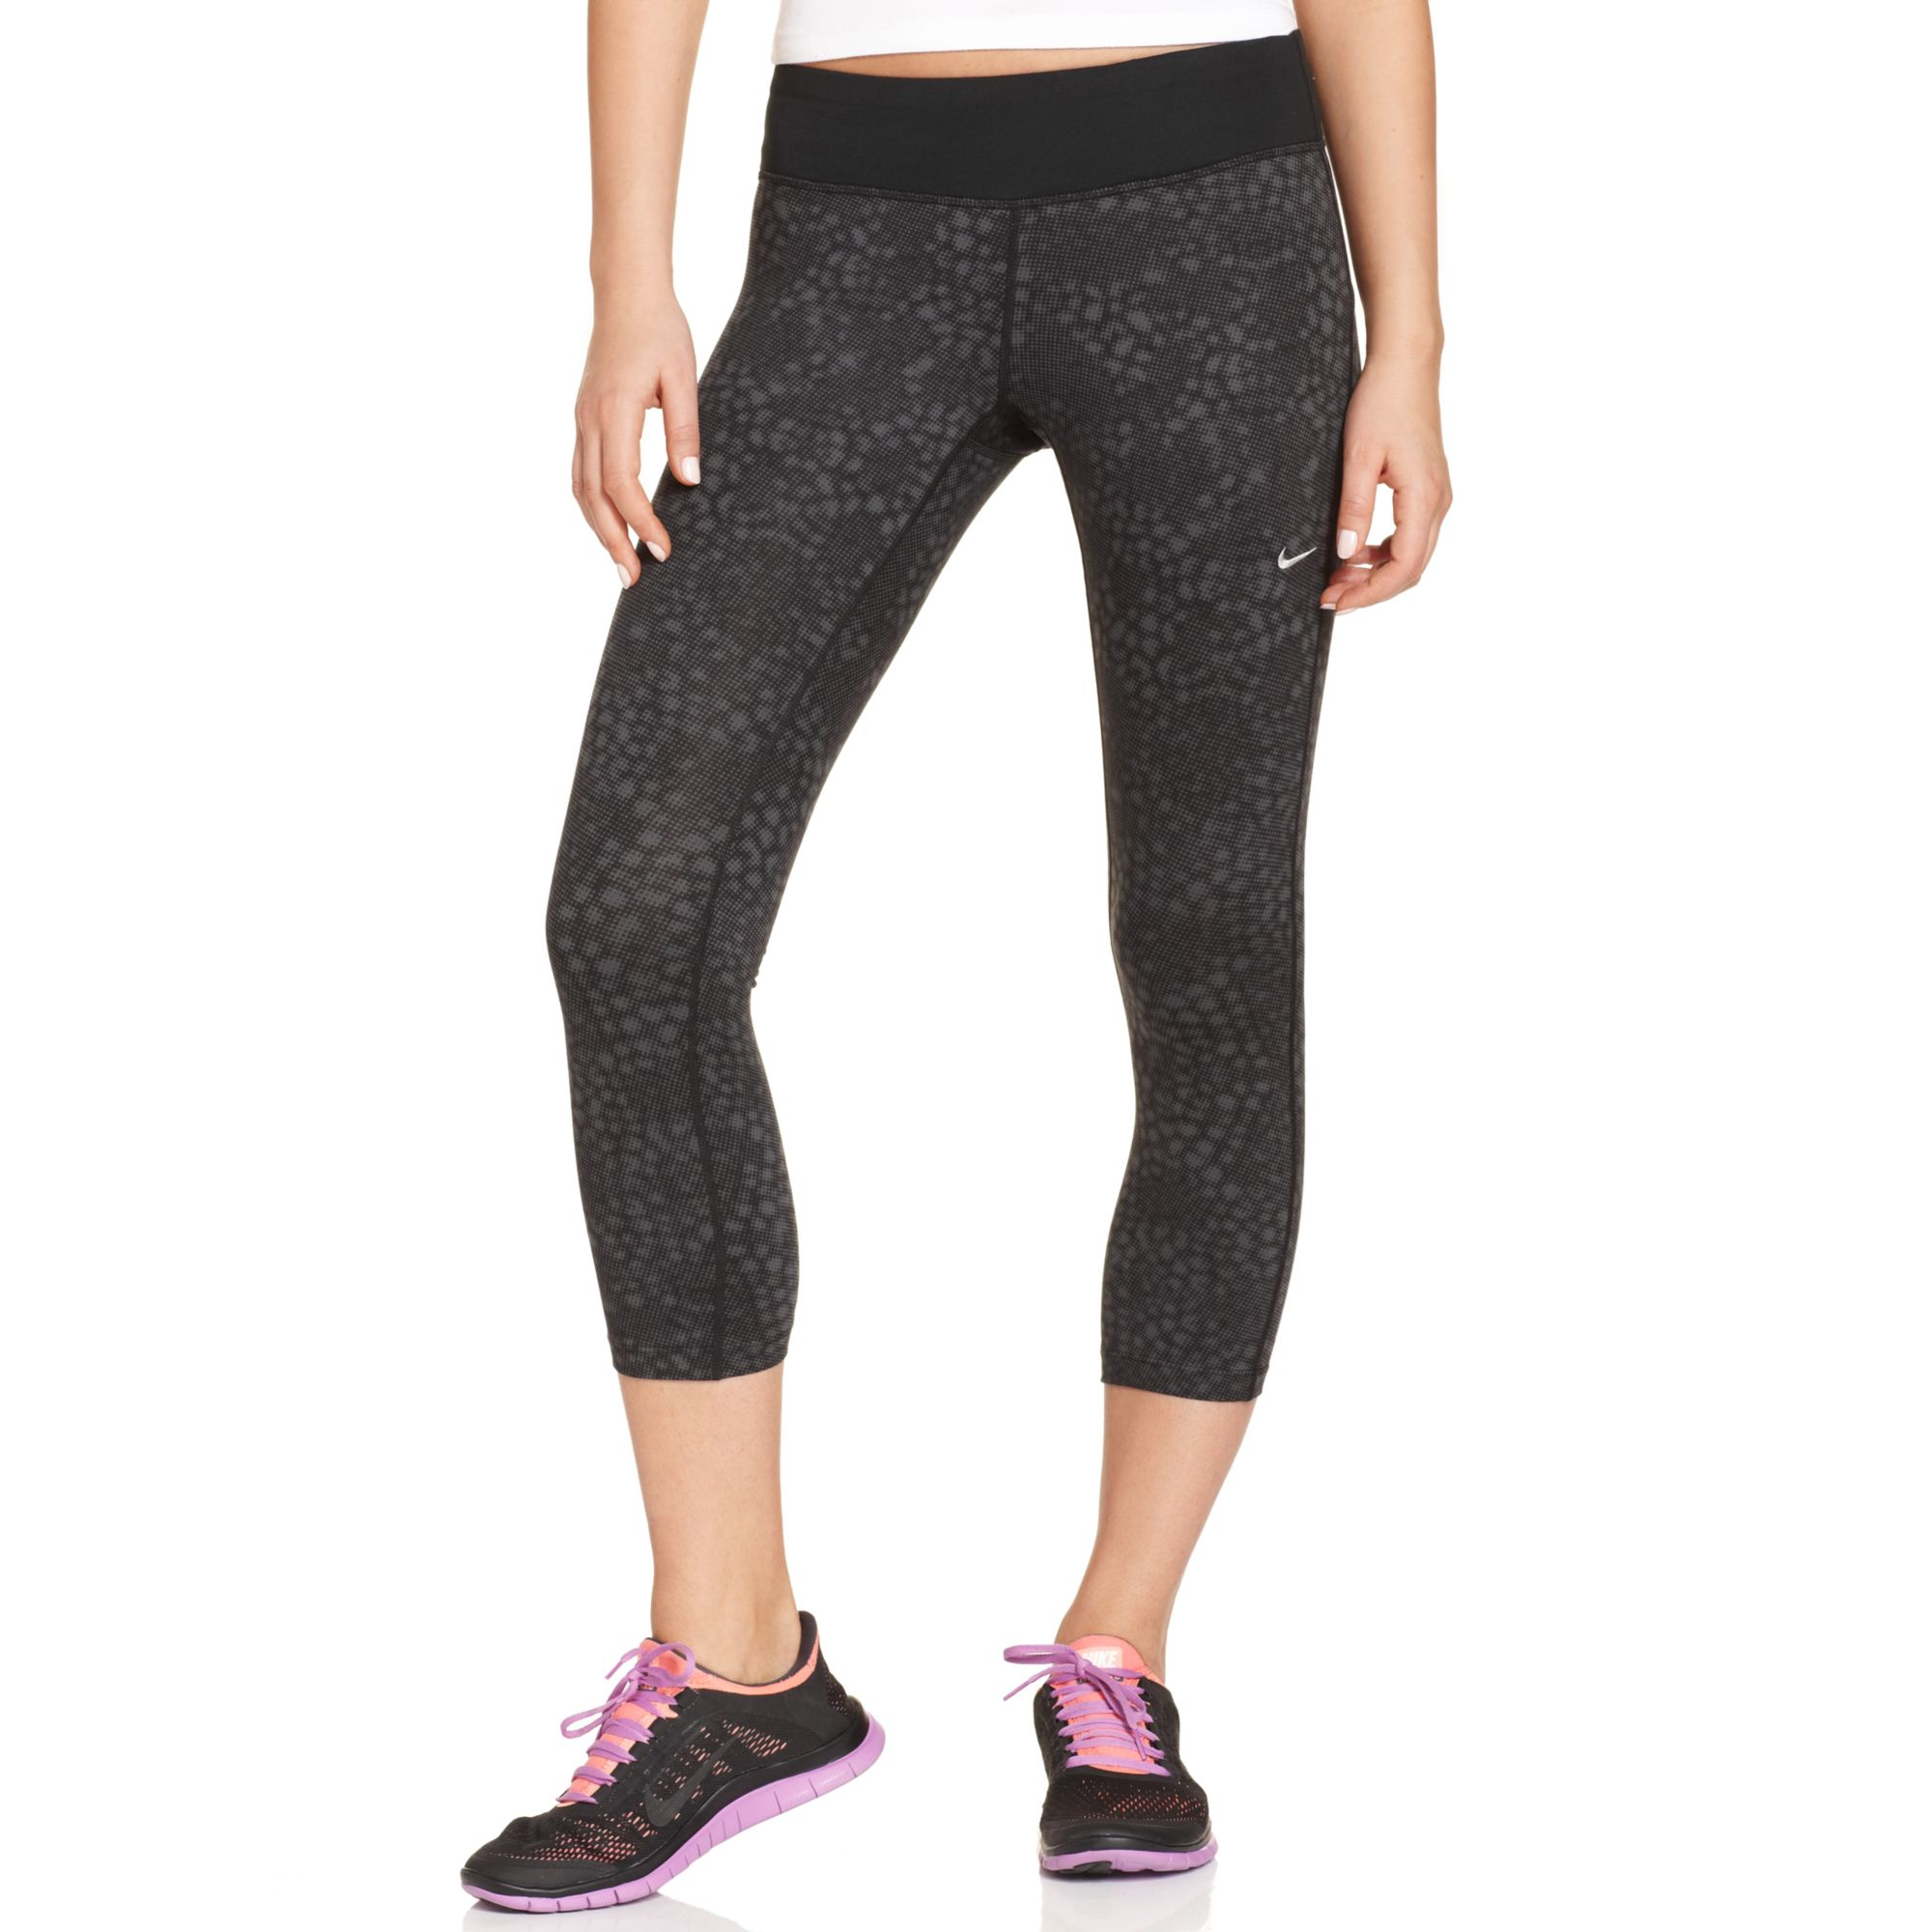 e7edc7e8ab7c1 Nike Epic Run Snakeskin-print Capri Leggings in Black - Lyst